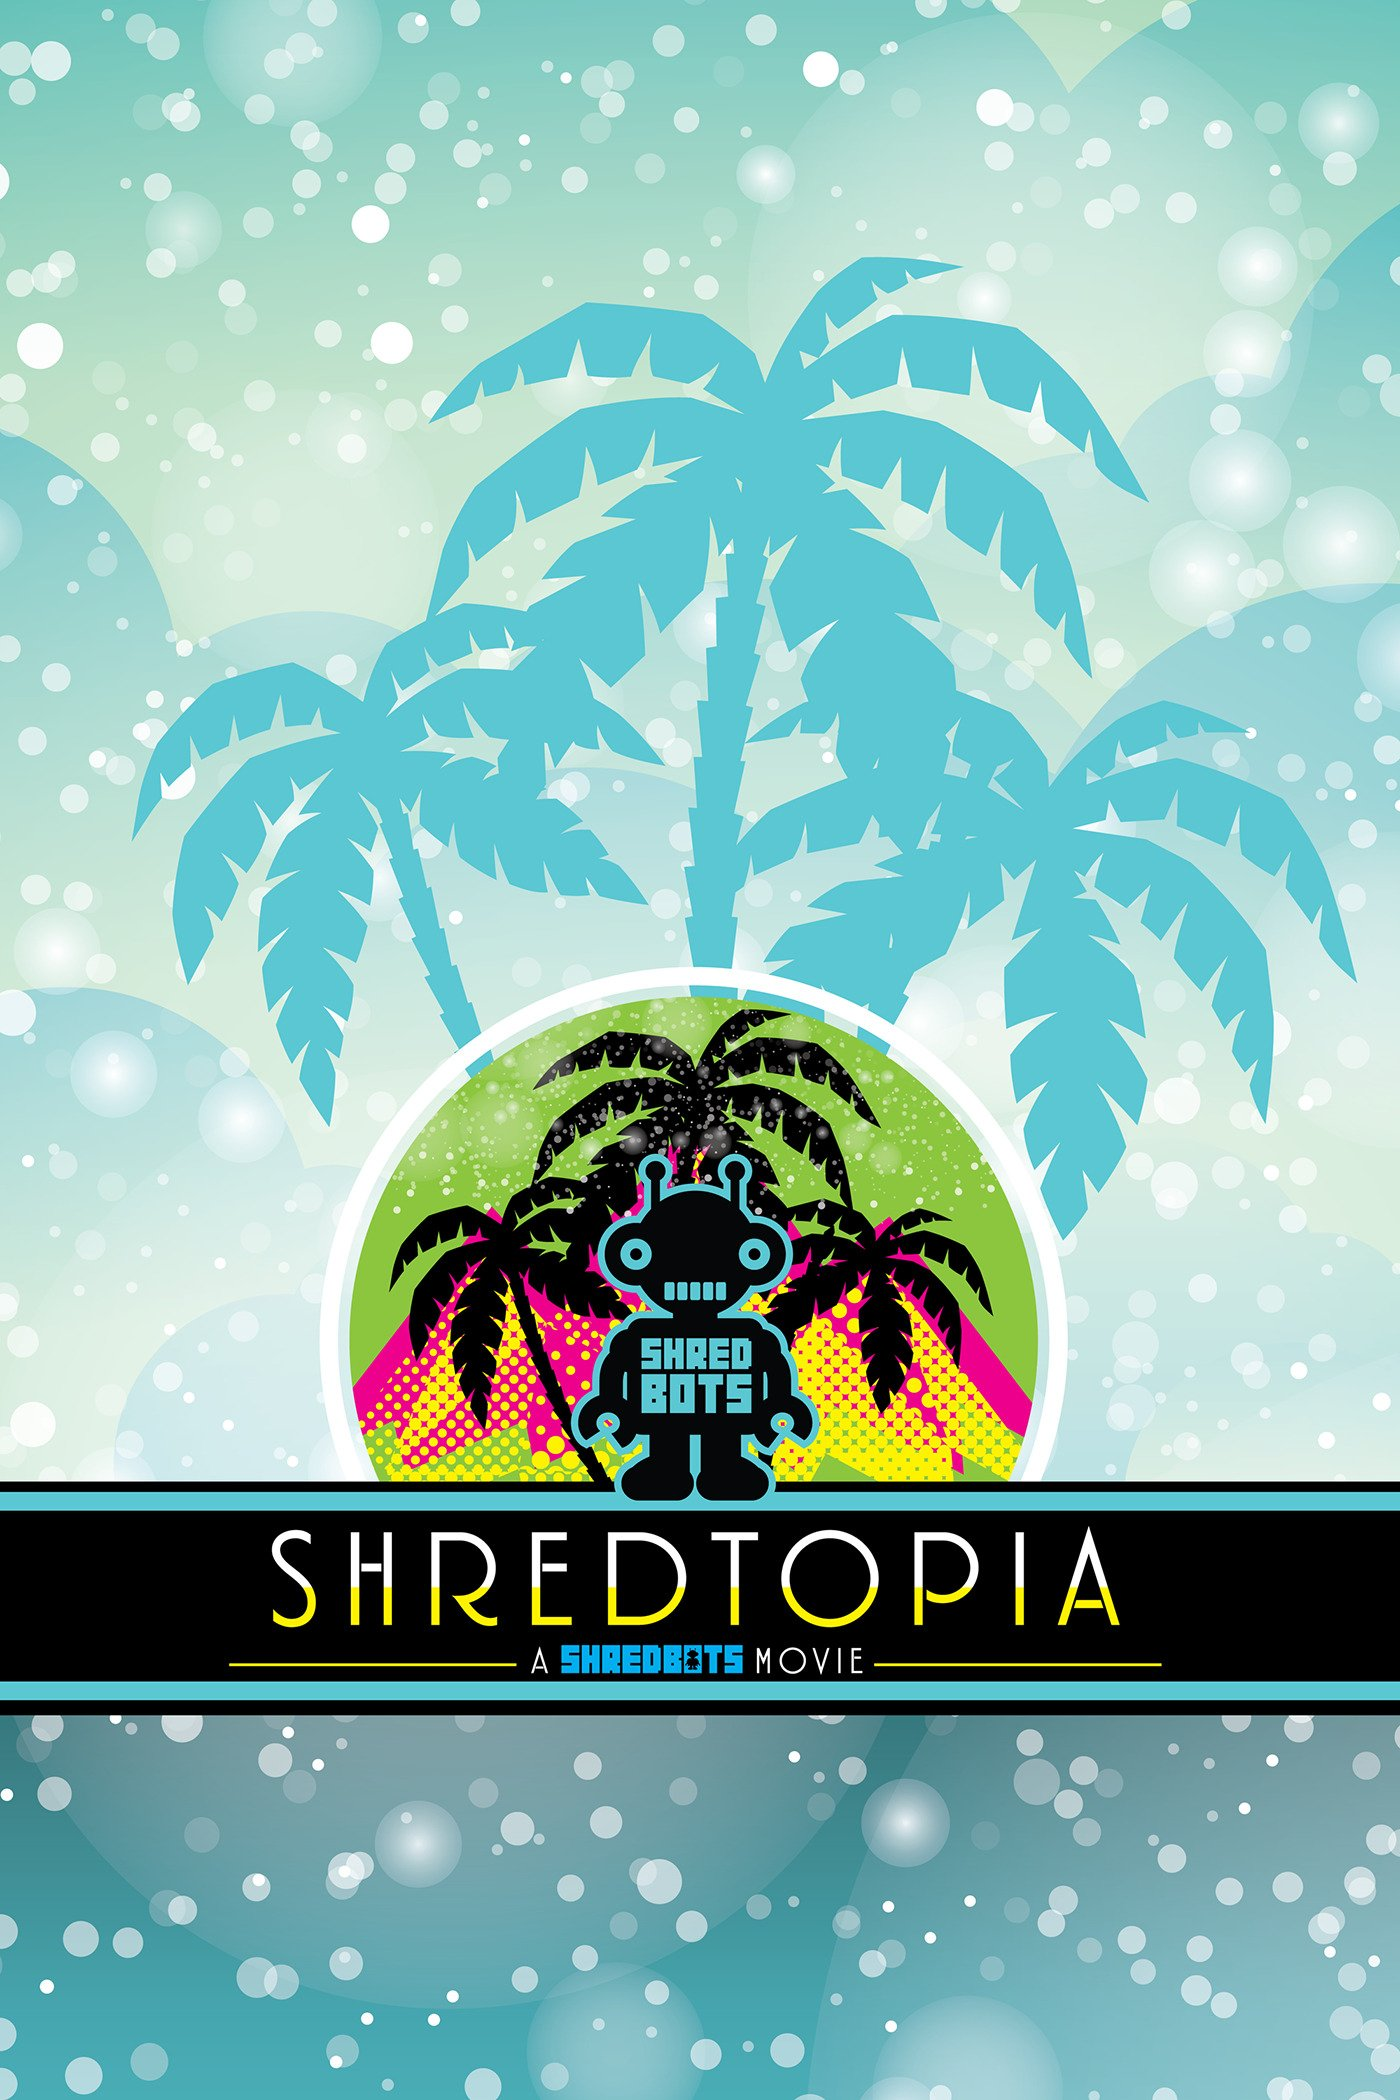 Shredtopia (2015)